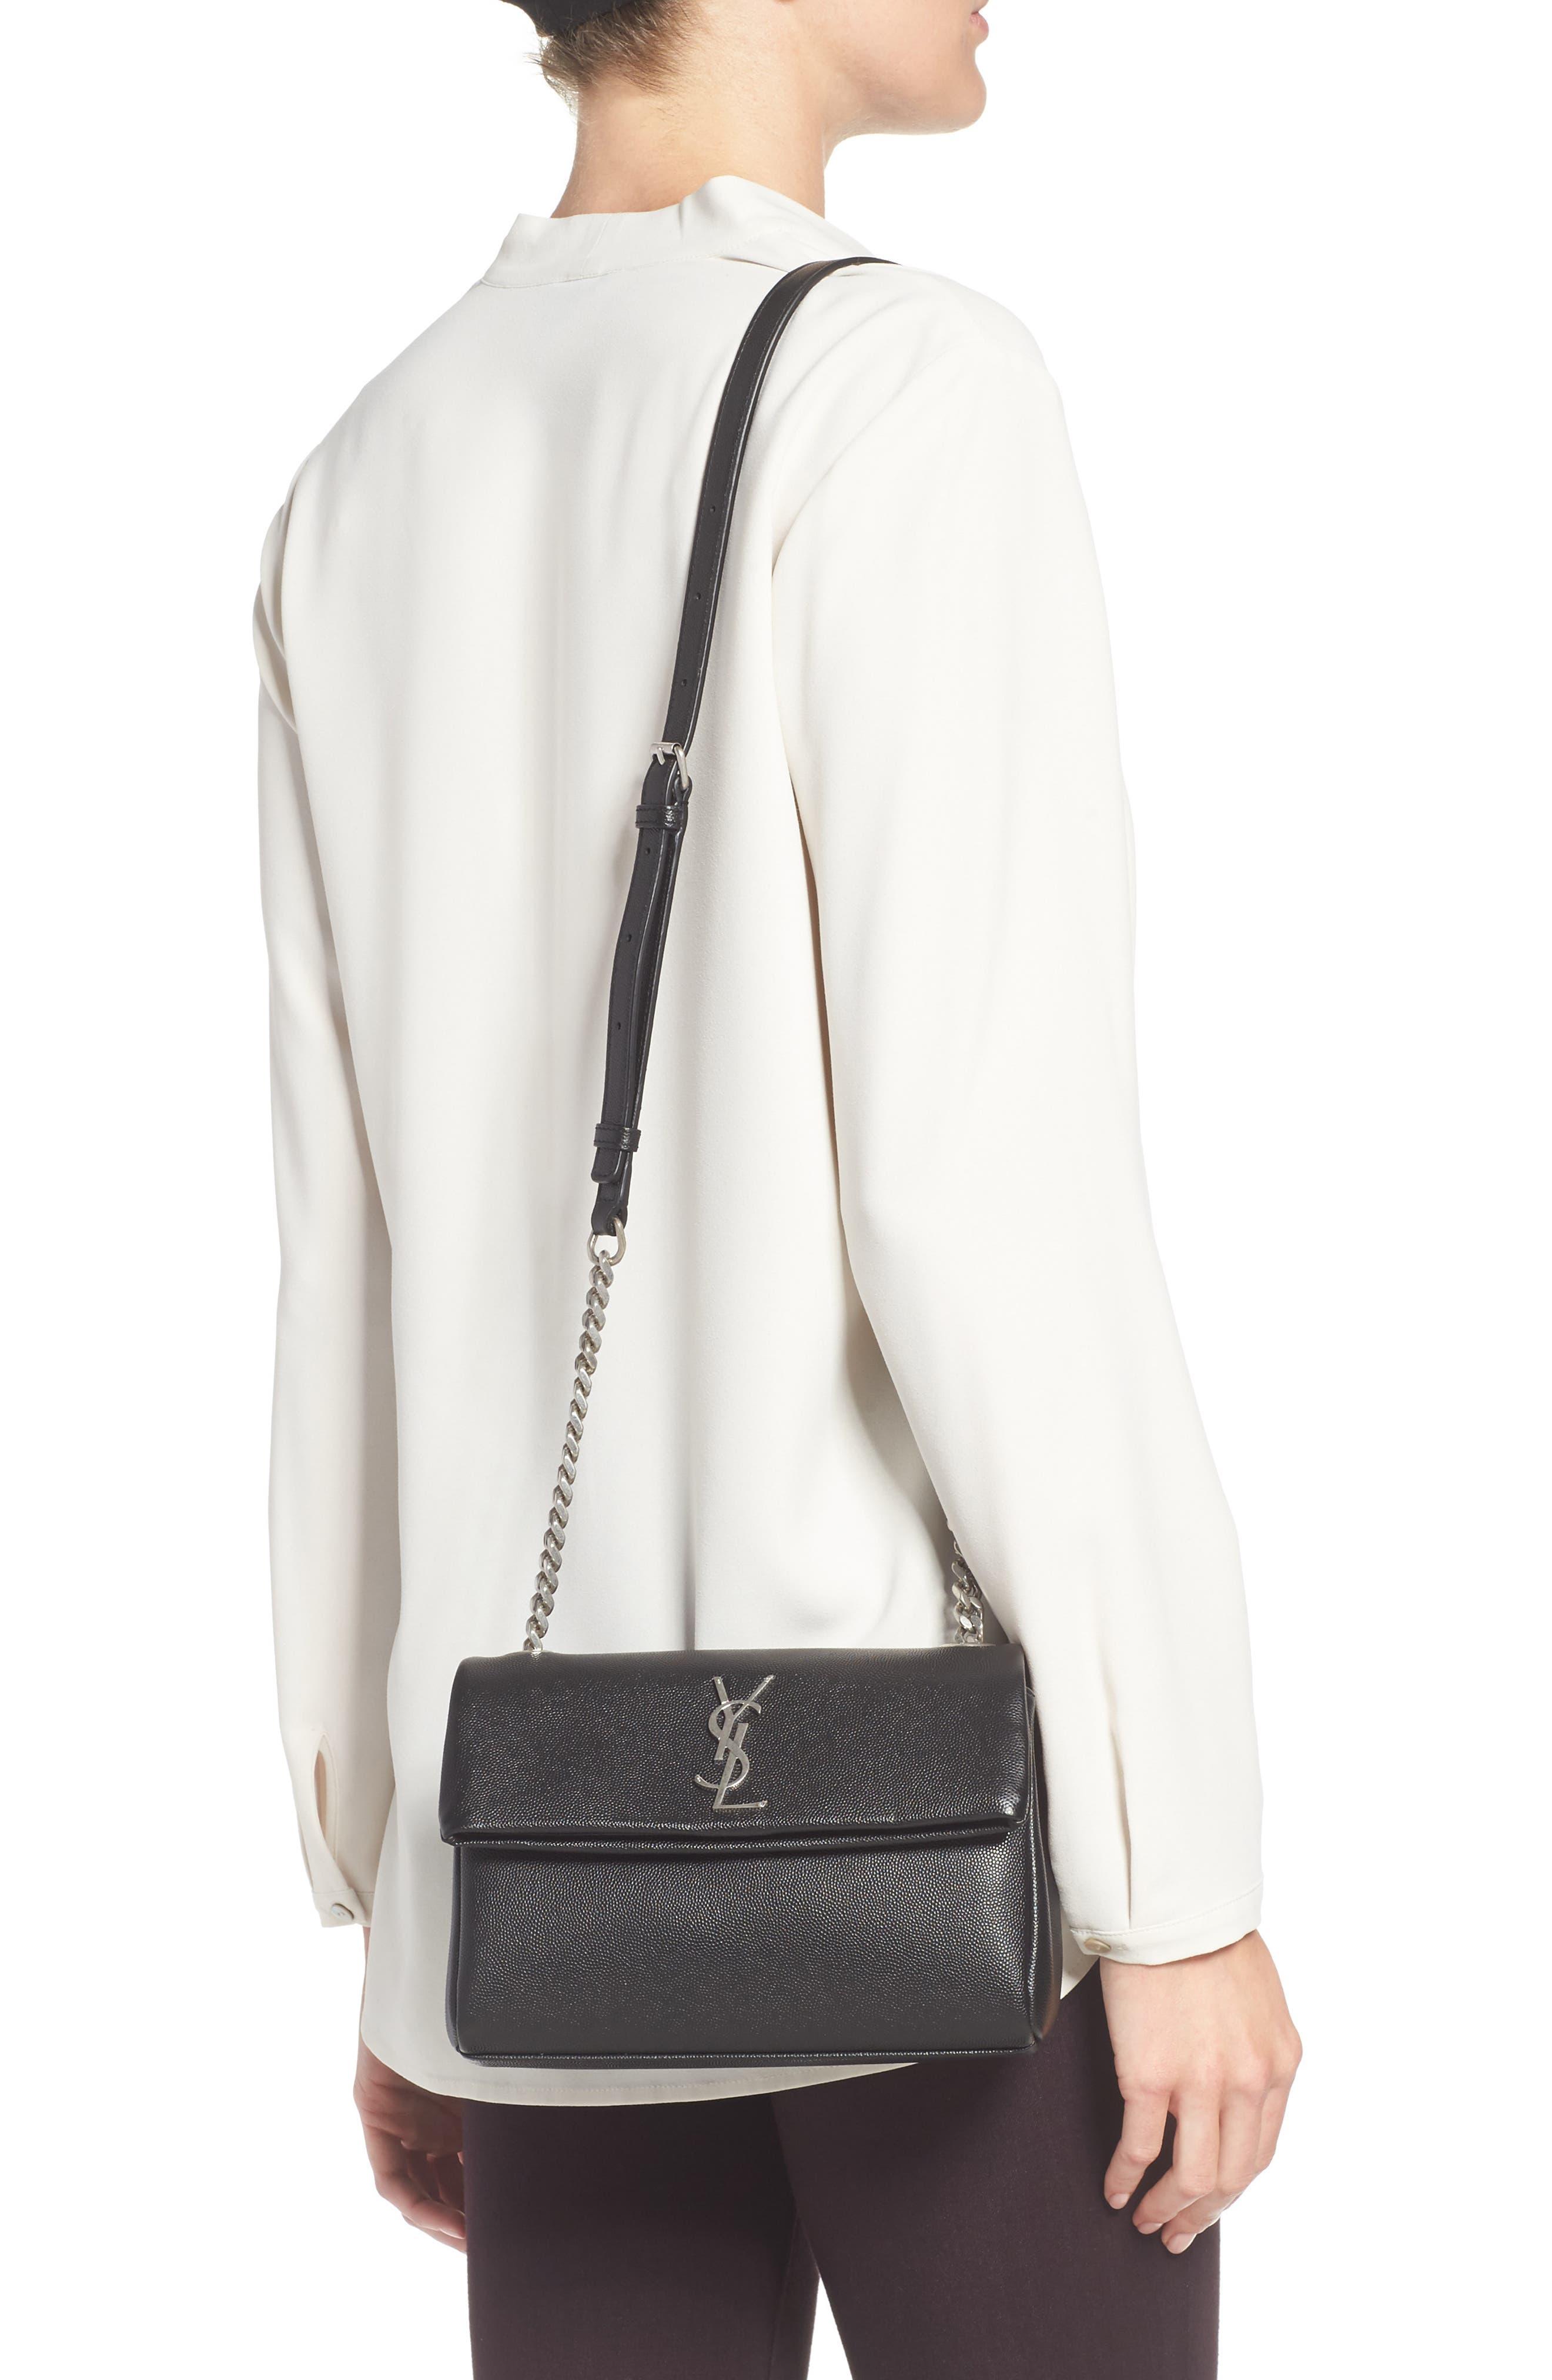 West Hollywood Calfskin Leather Messenger Bag,                             Alternate thumbnail 6, color,